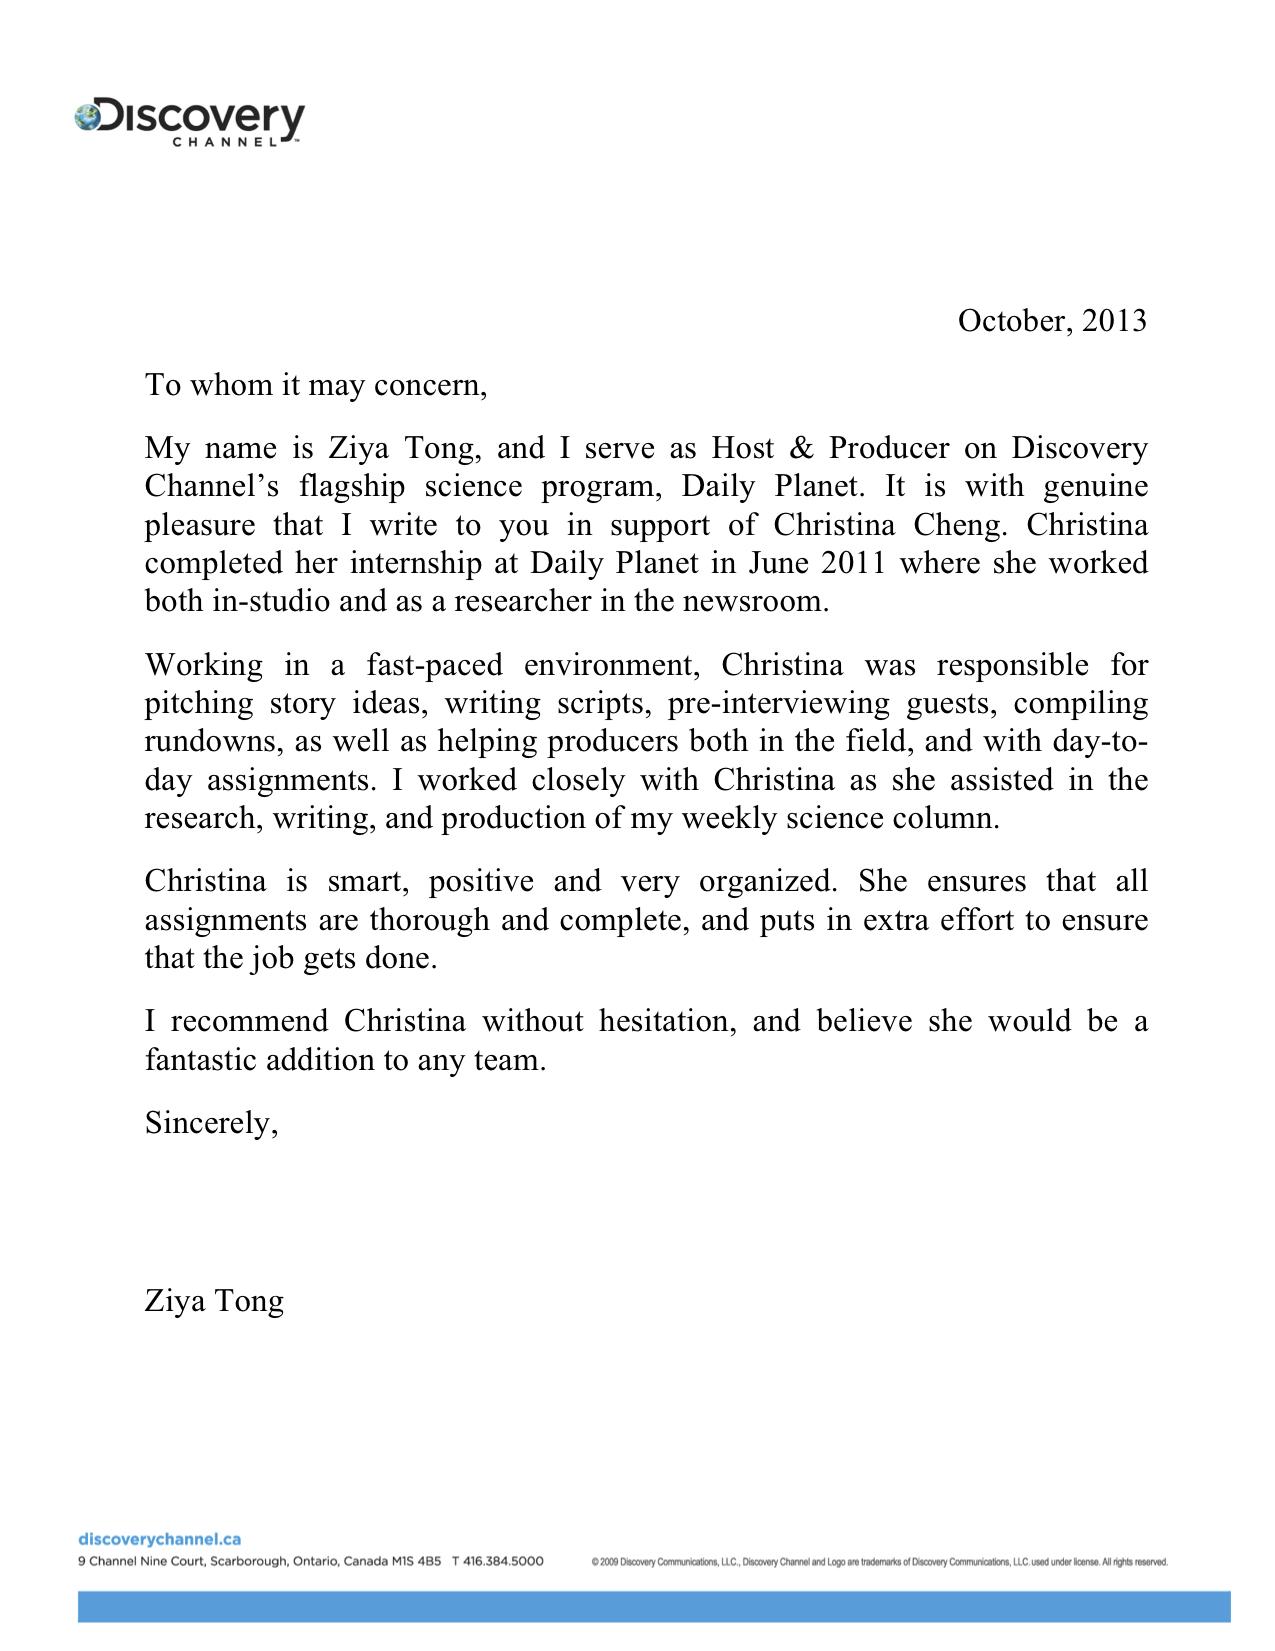 Christina Cheng_Reference_DAILY PLANET copy.jpg